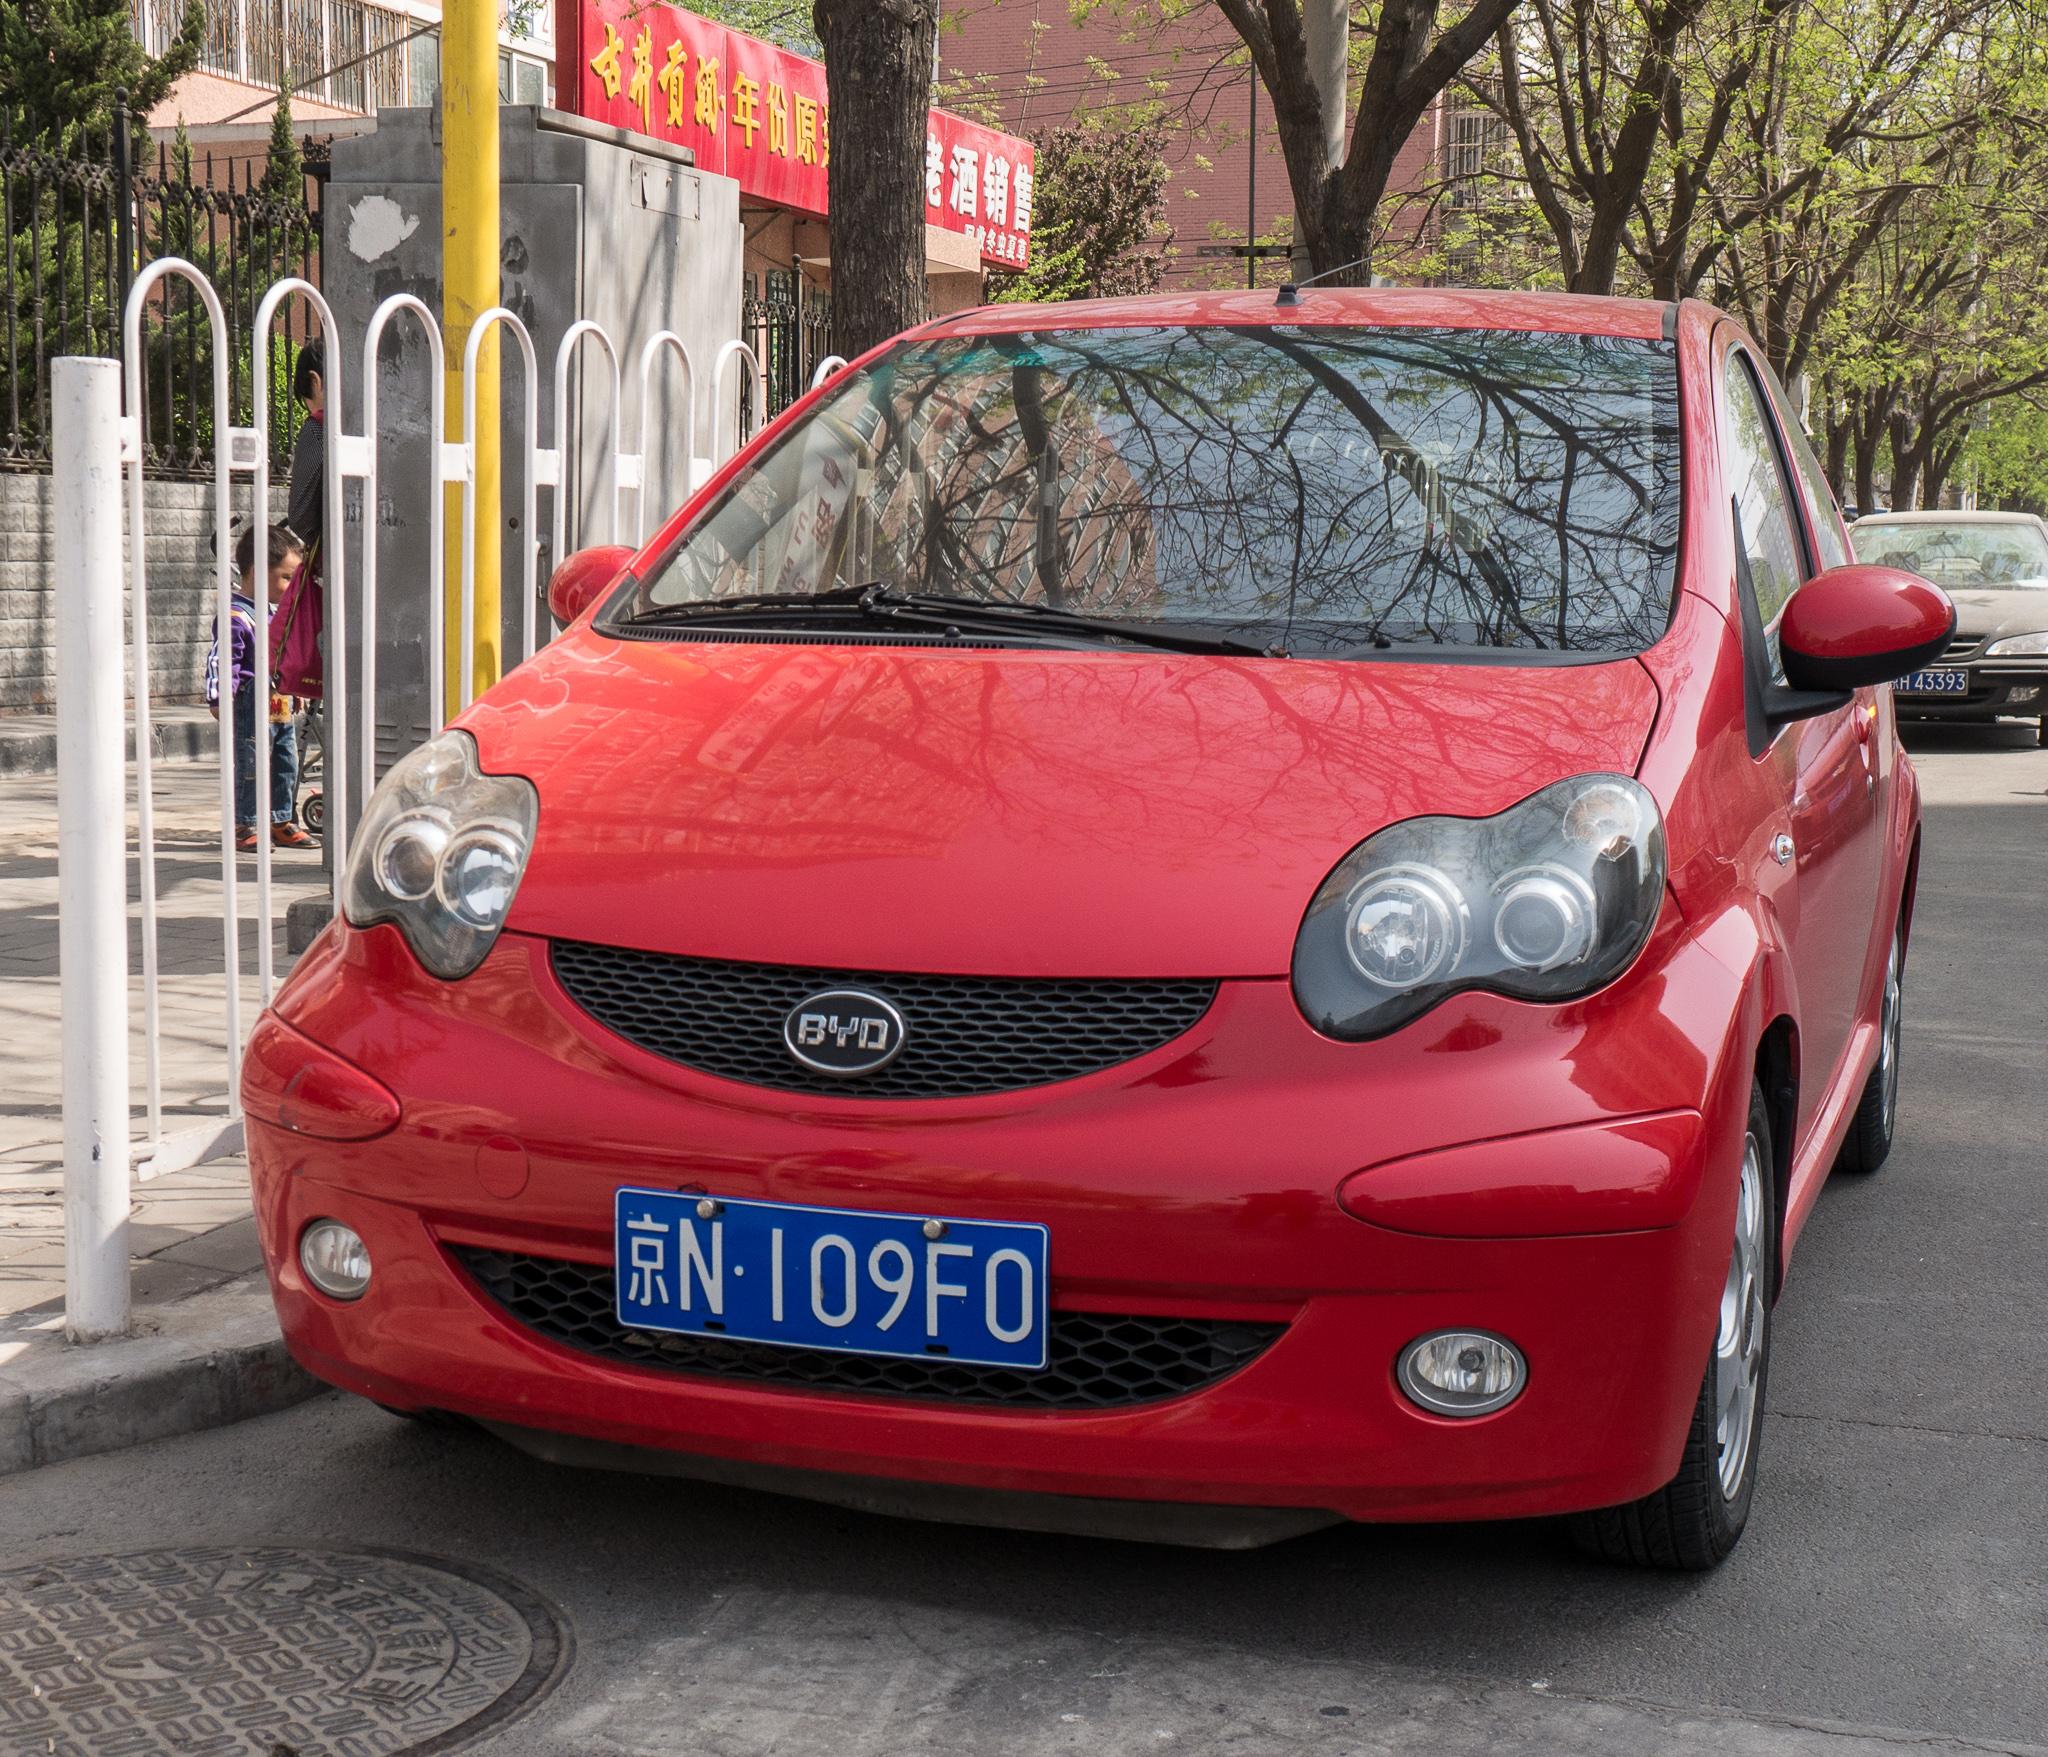 Tsinchuan Automobile Company | Cars of Beijing